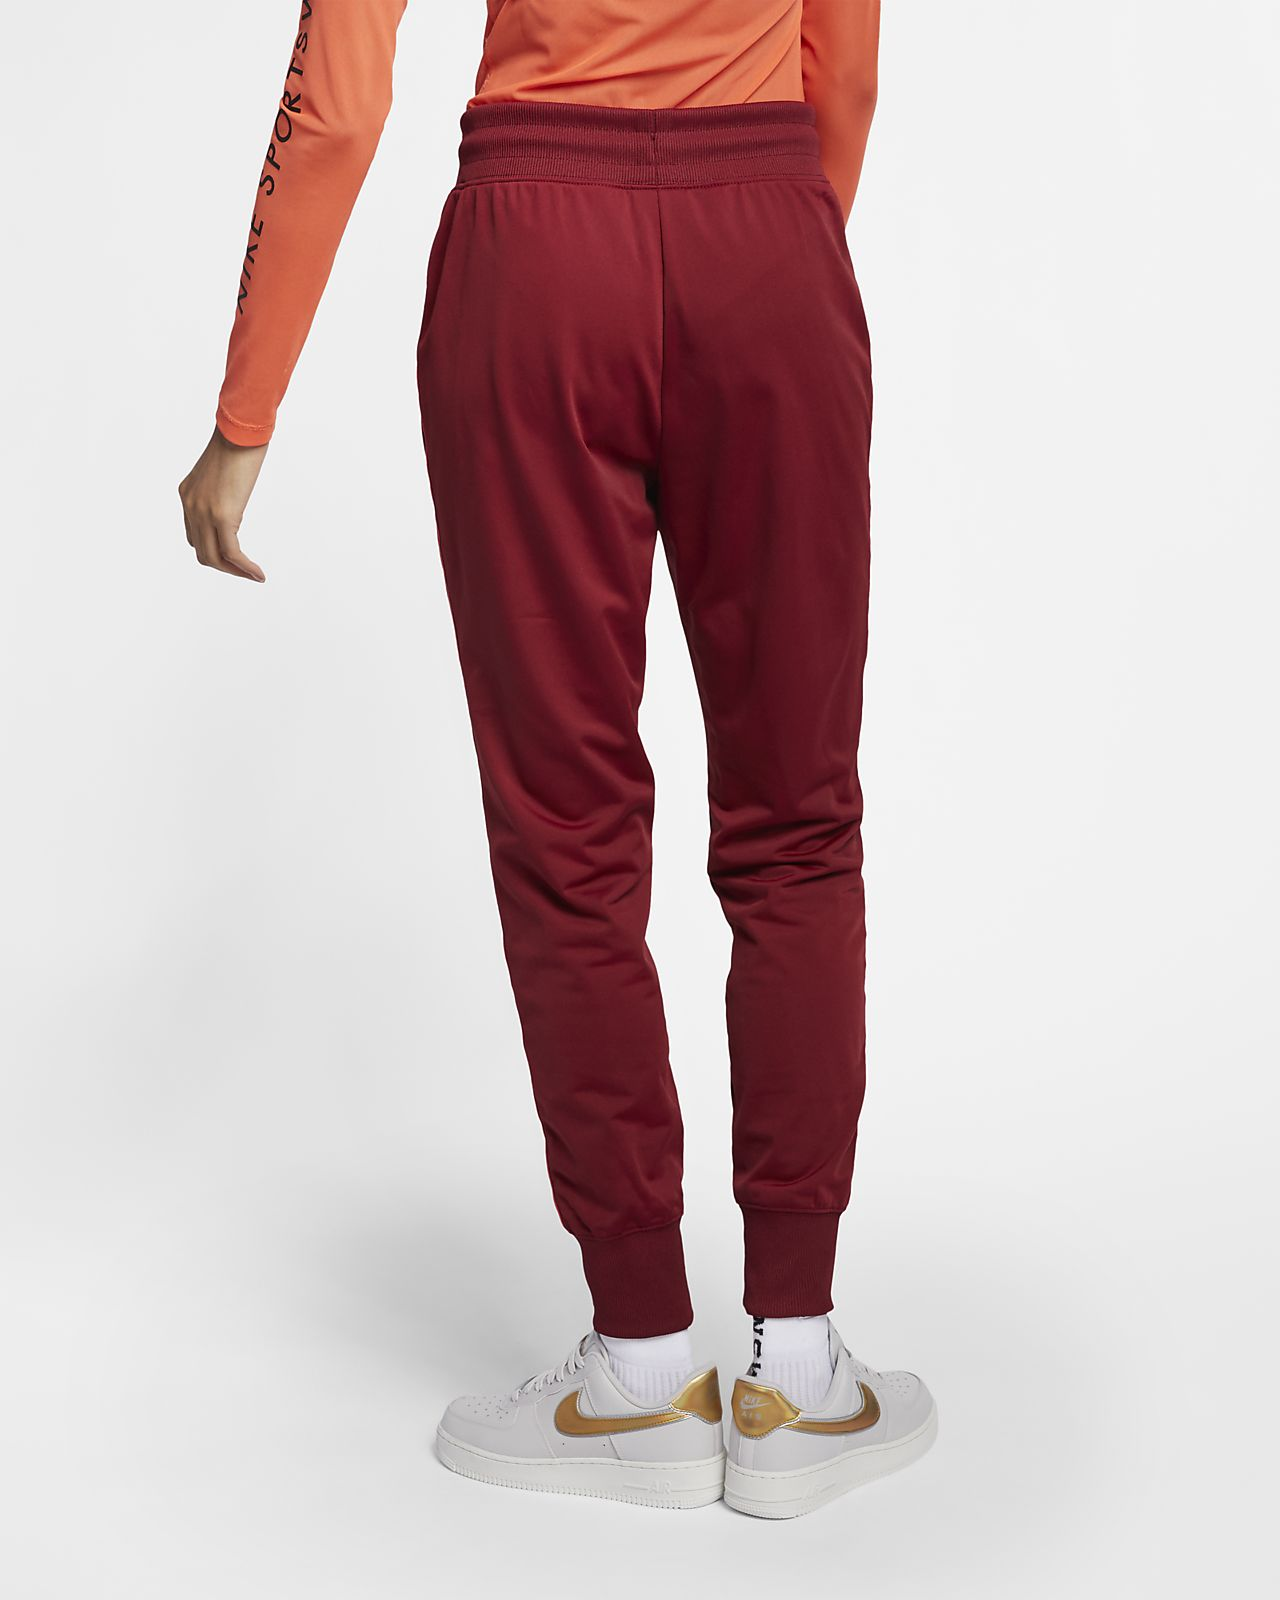 Pour Ca Femme Pantalon Nike De Sportswear Jogging Heritage q07xFX4Aw 555b0ac1aad